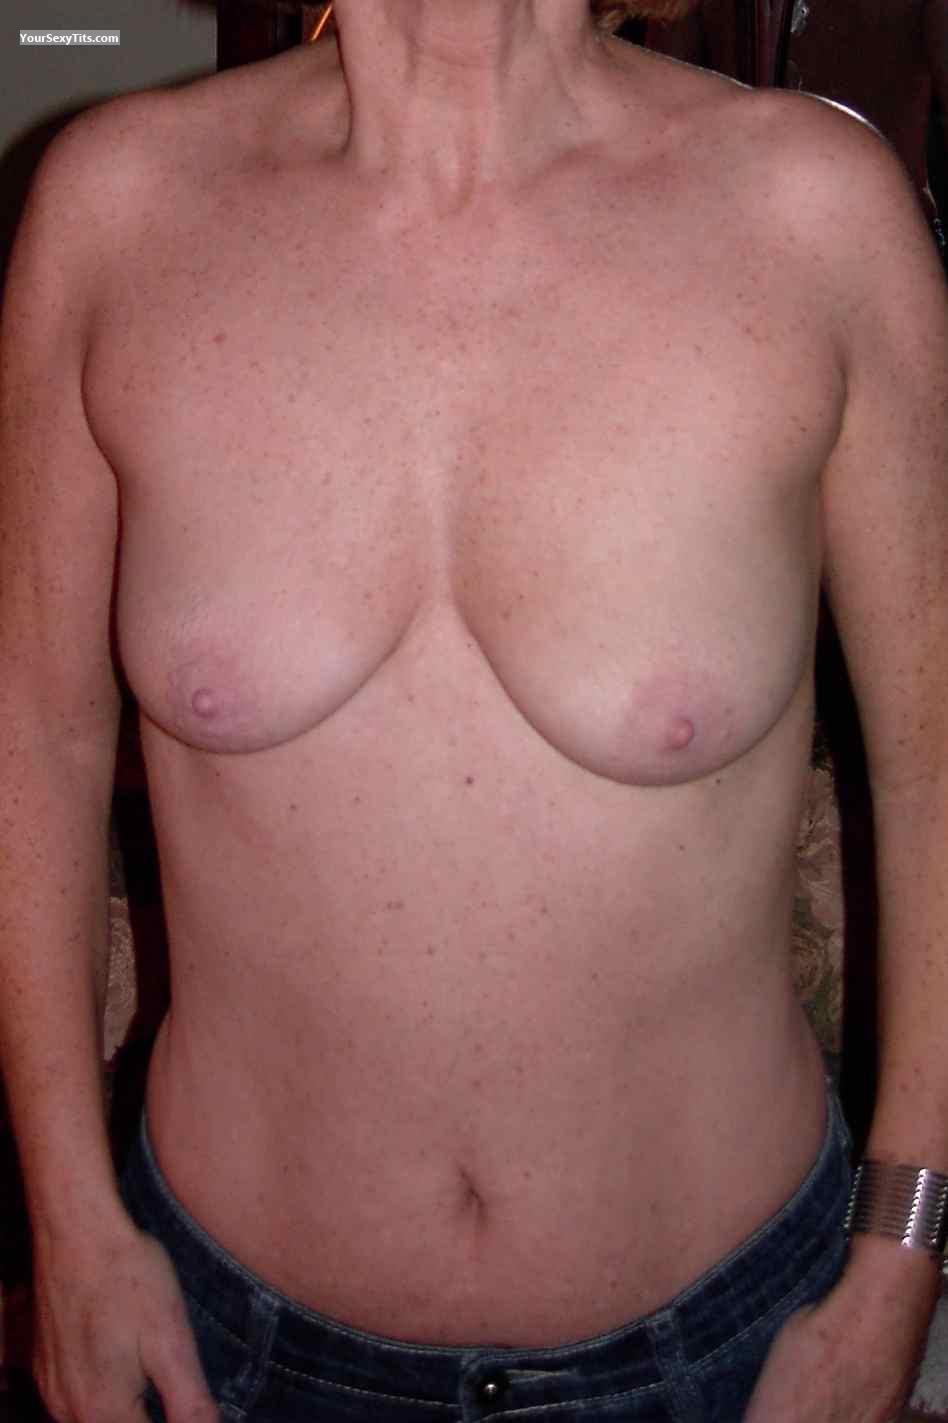 Small Tits - Pale Nipples from Canada Tit Flash ID 24518